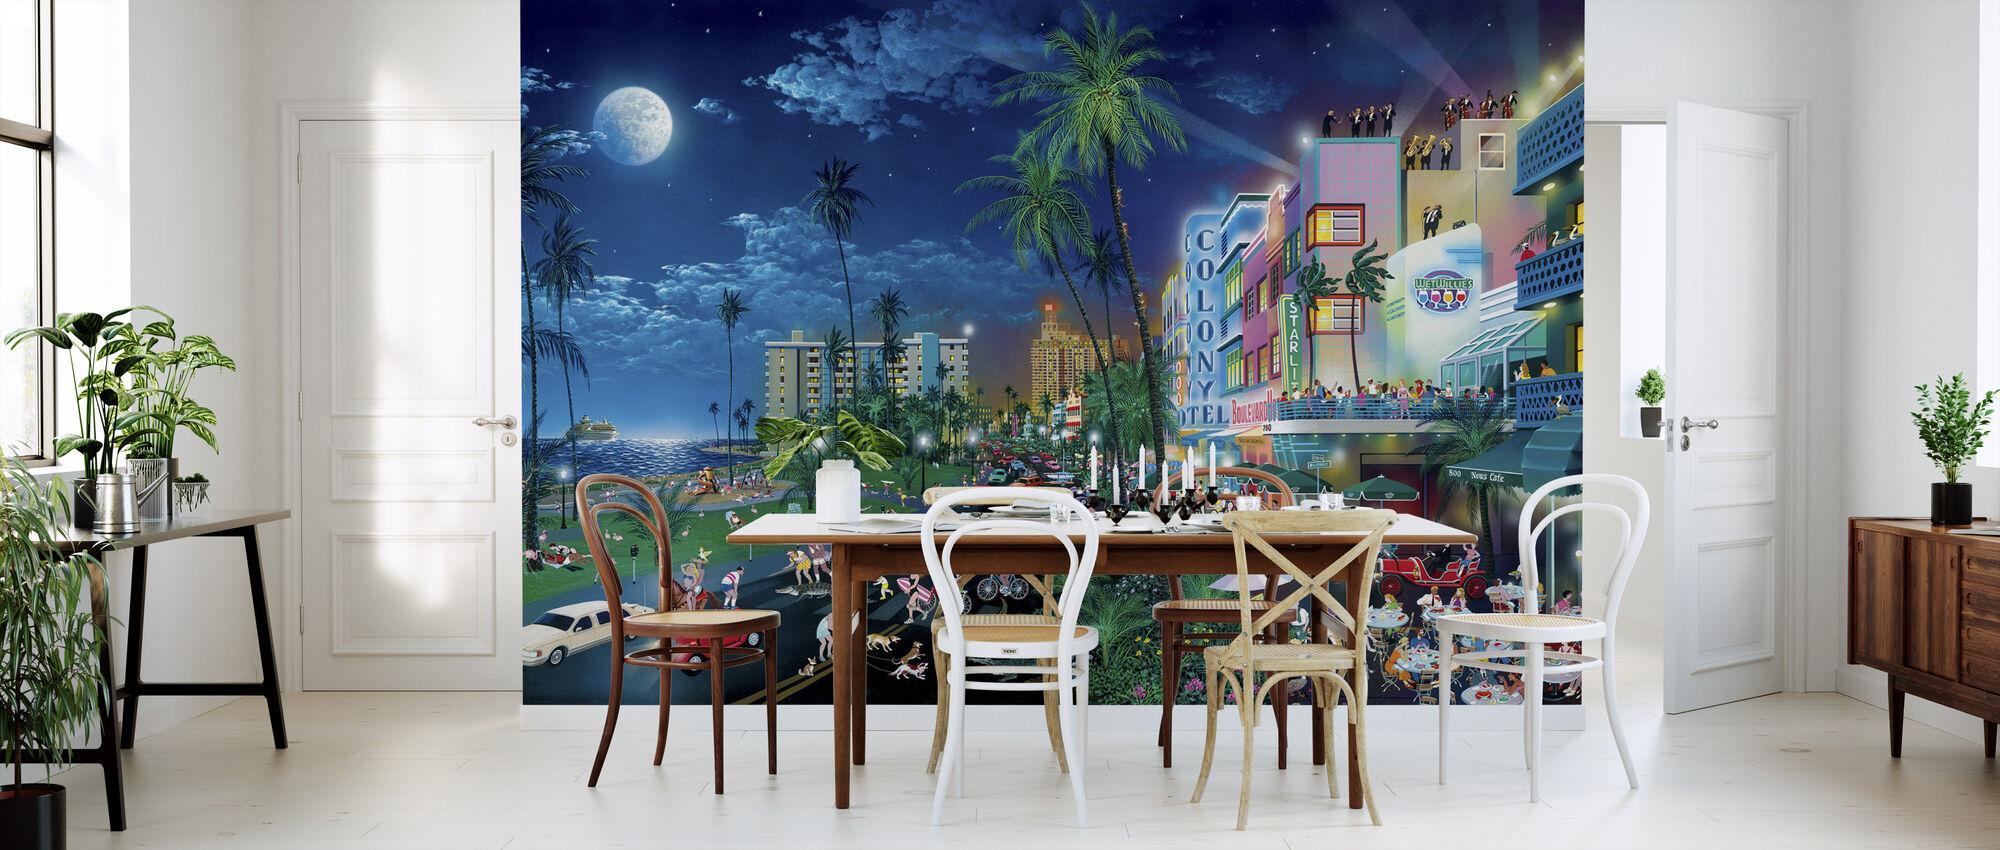 Miami South Beach - Wallpaper - Kitchen